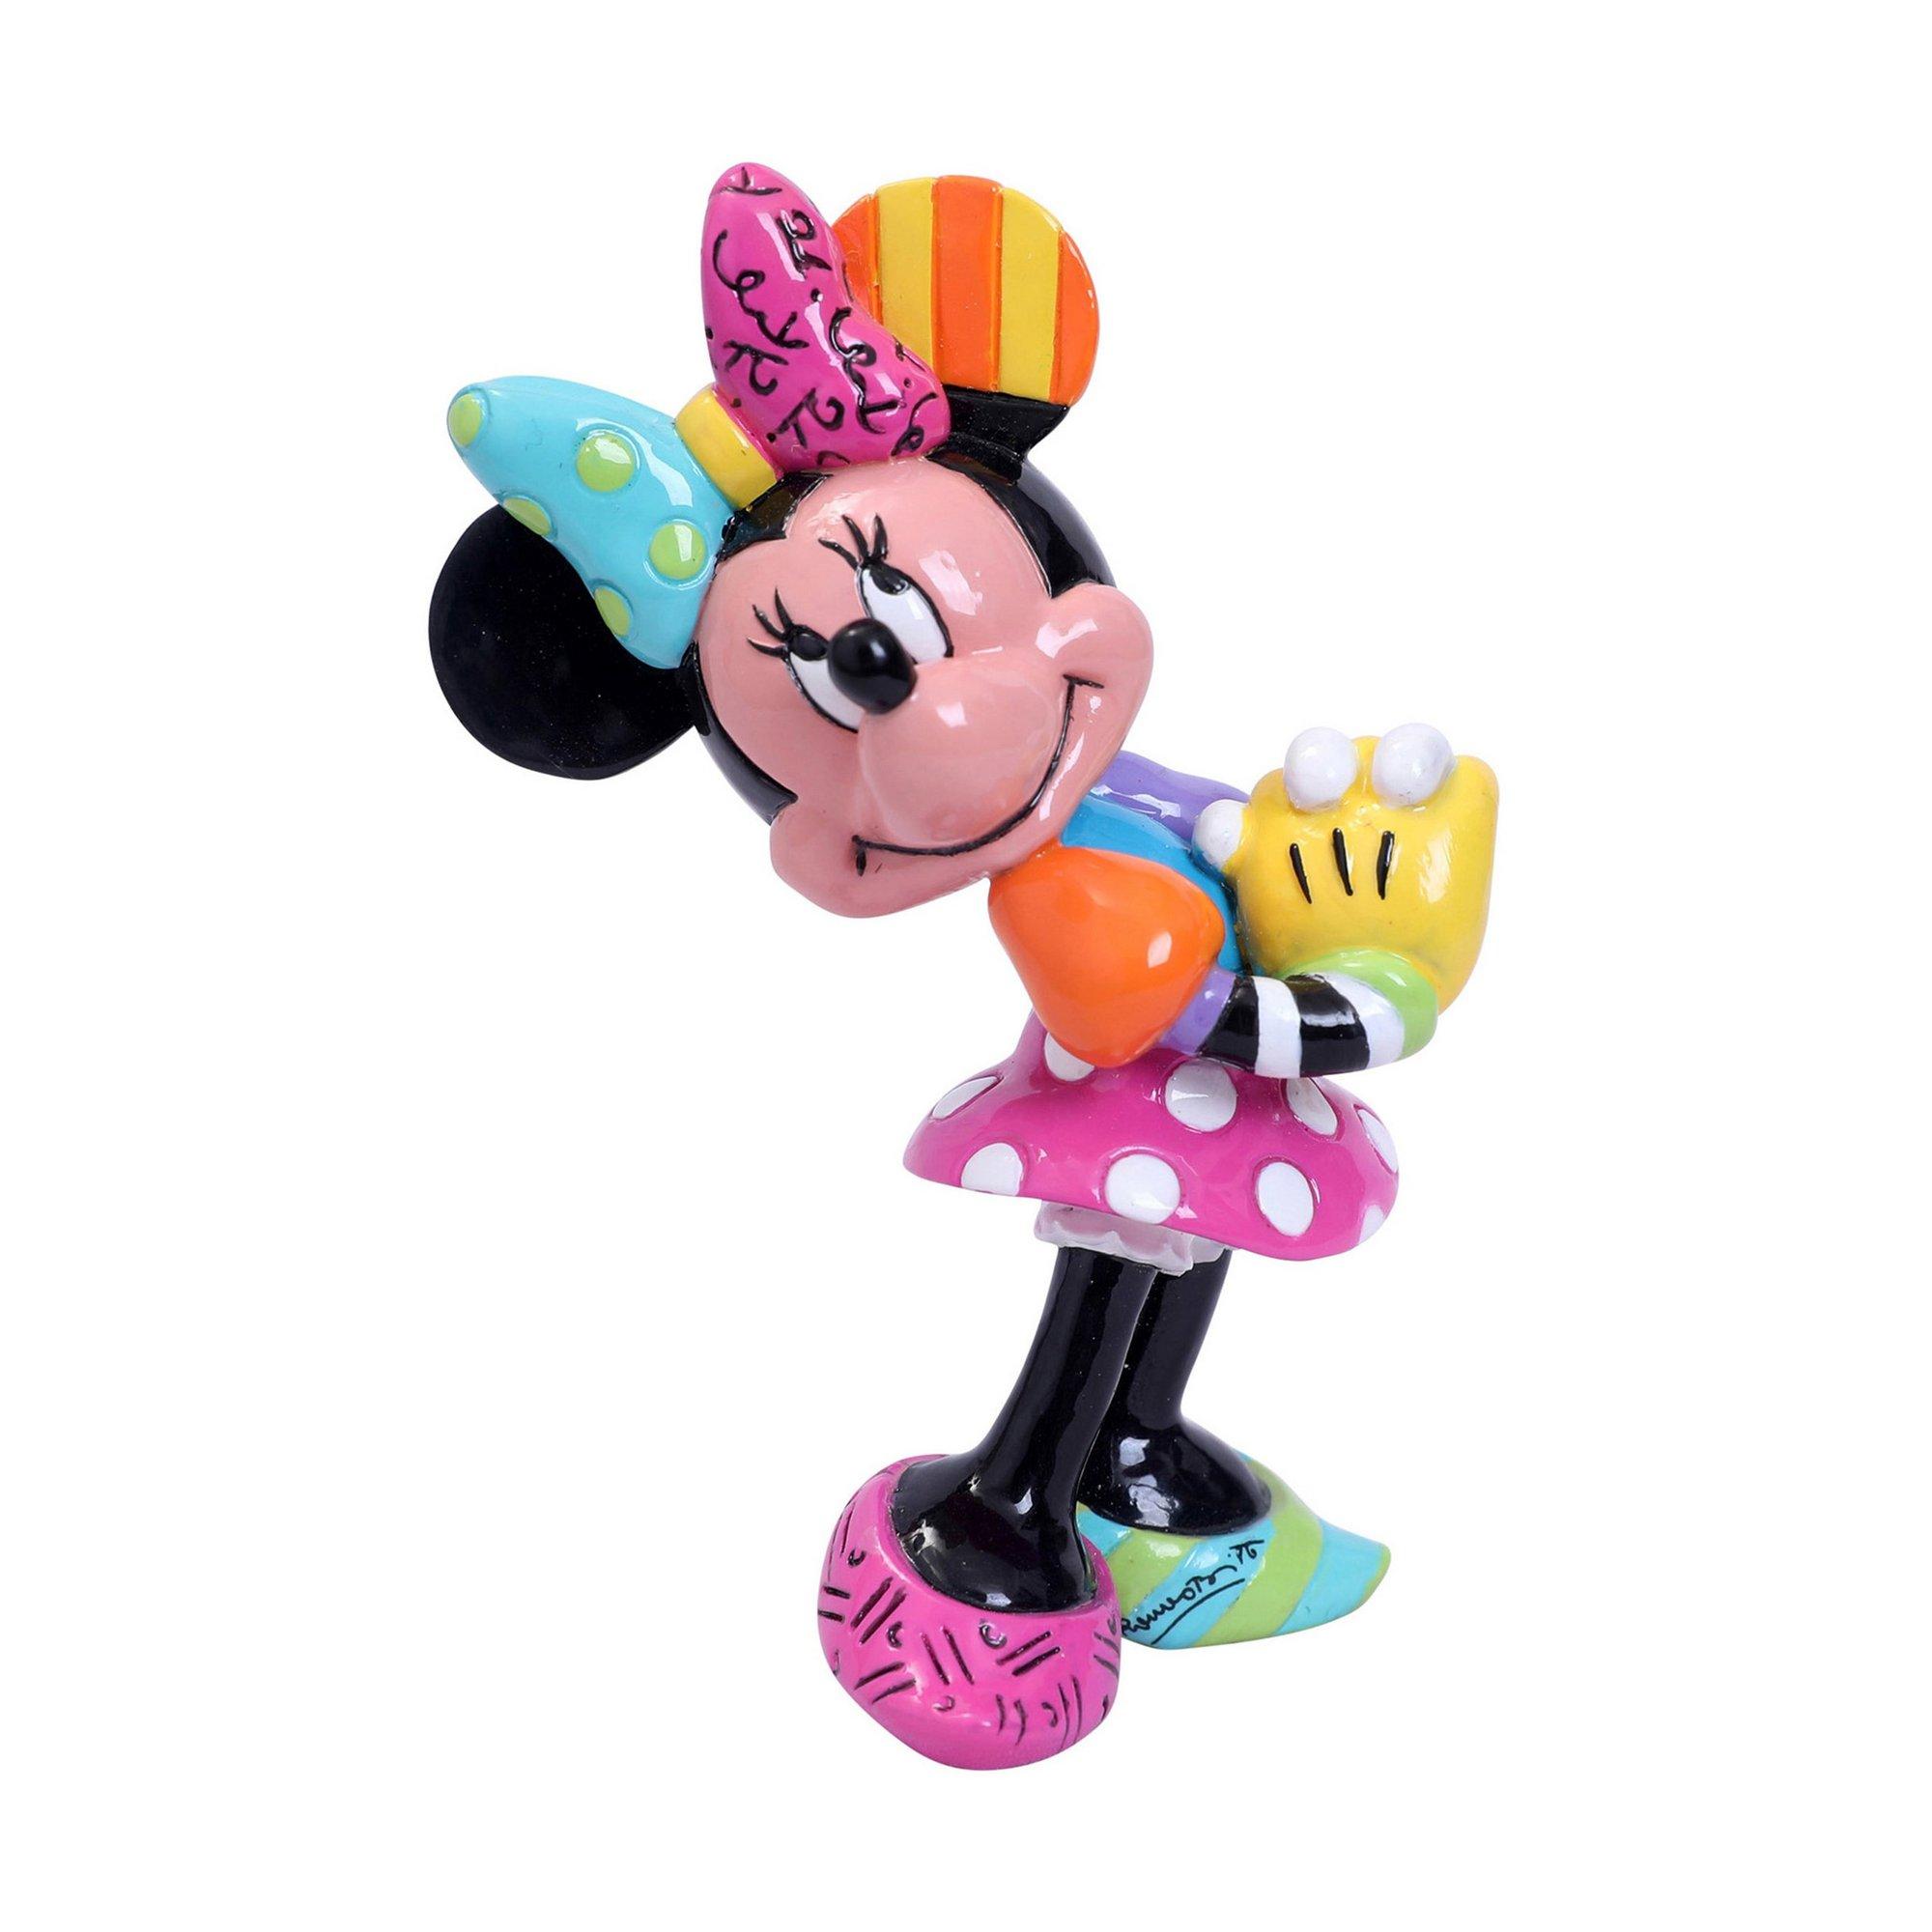 Image of Disney Minnie Mouse Blushing Mini Figurine